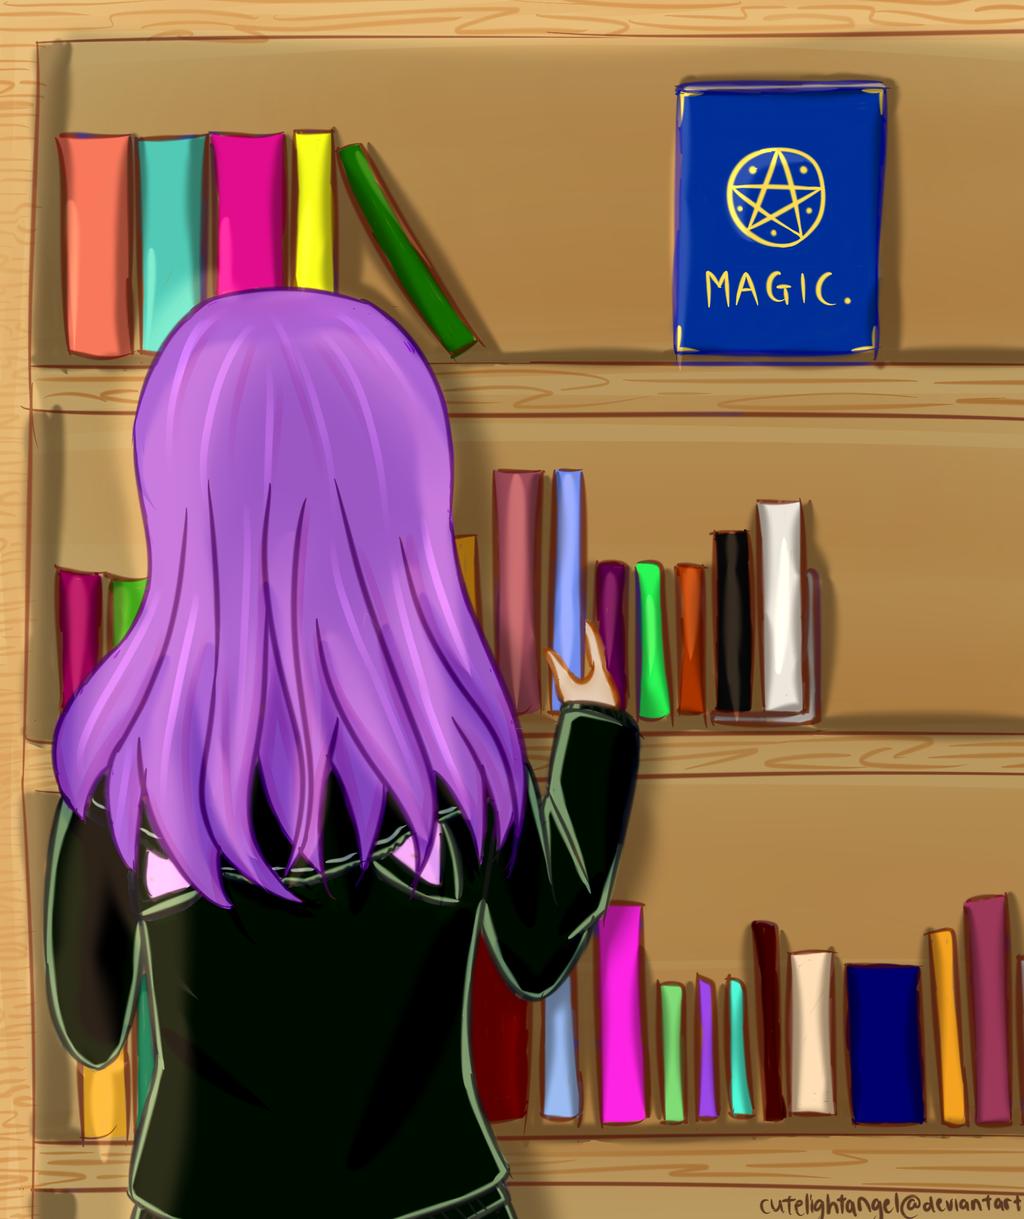 [Request] Sapphire by cutelightangel